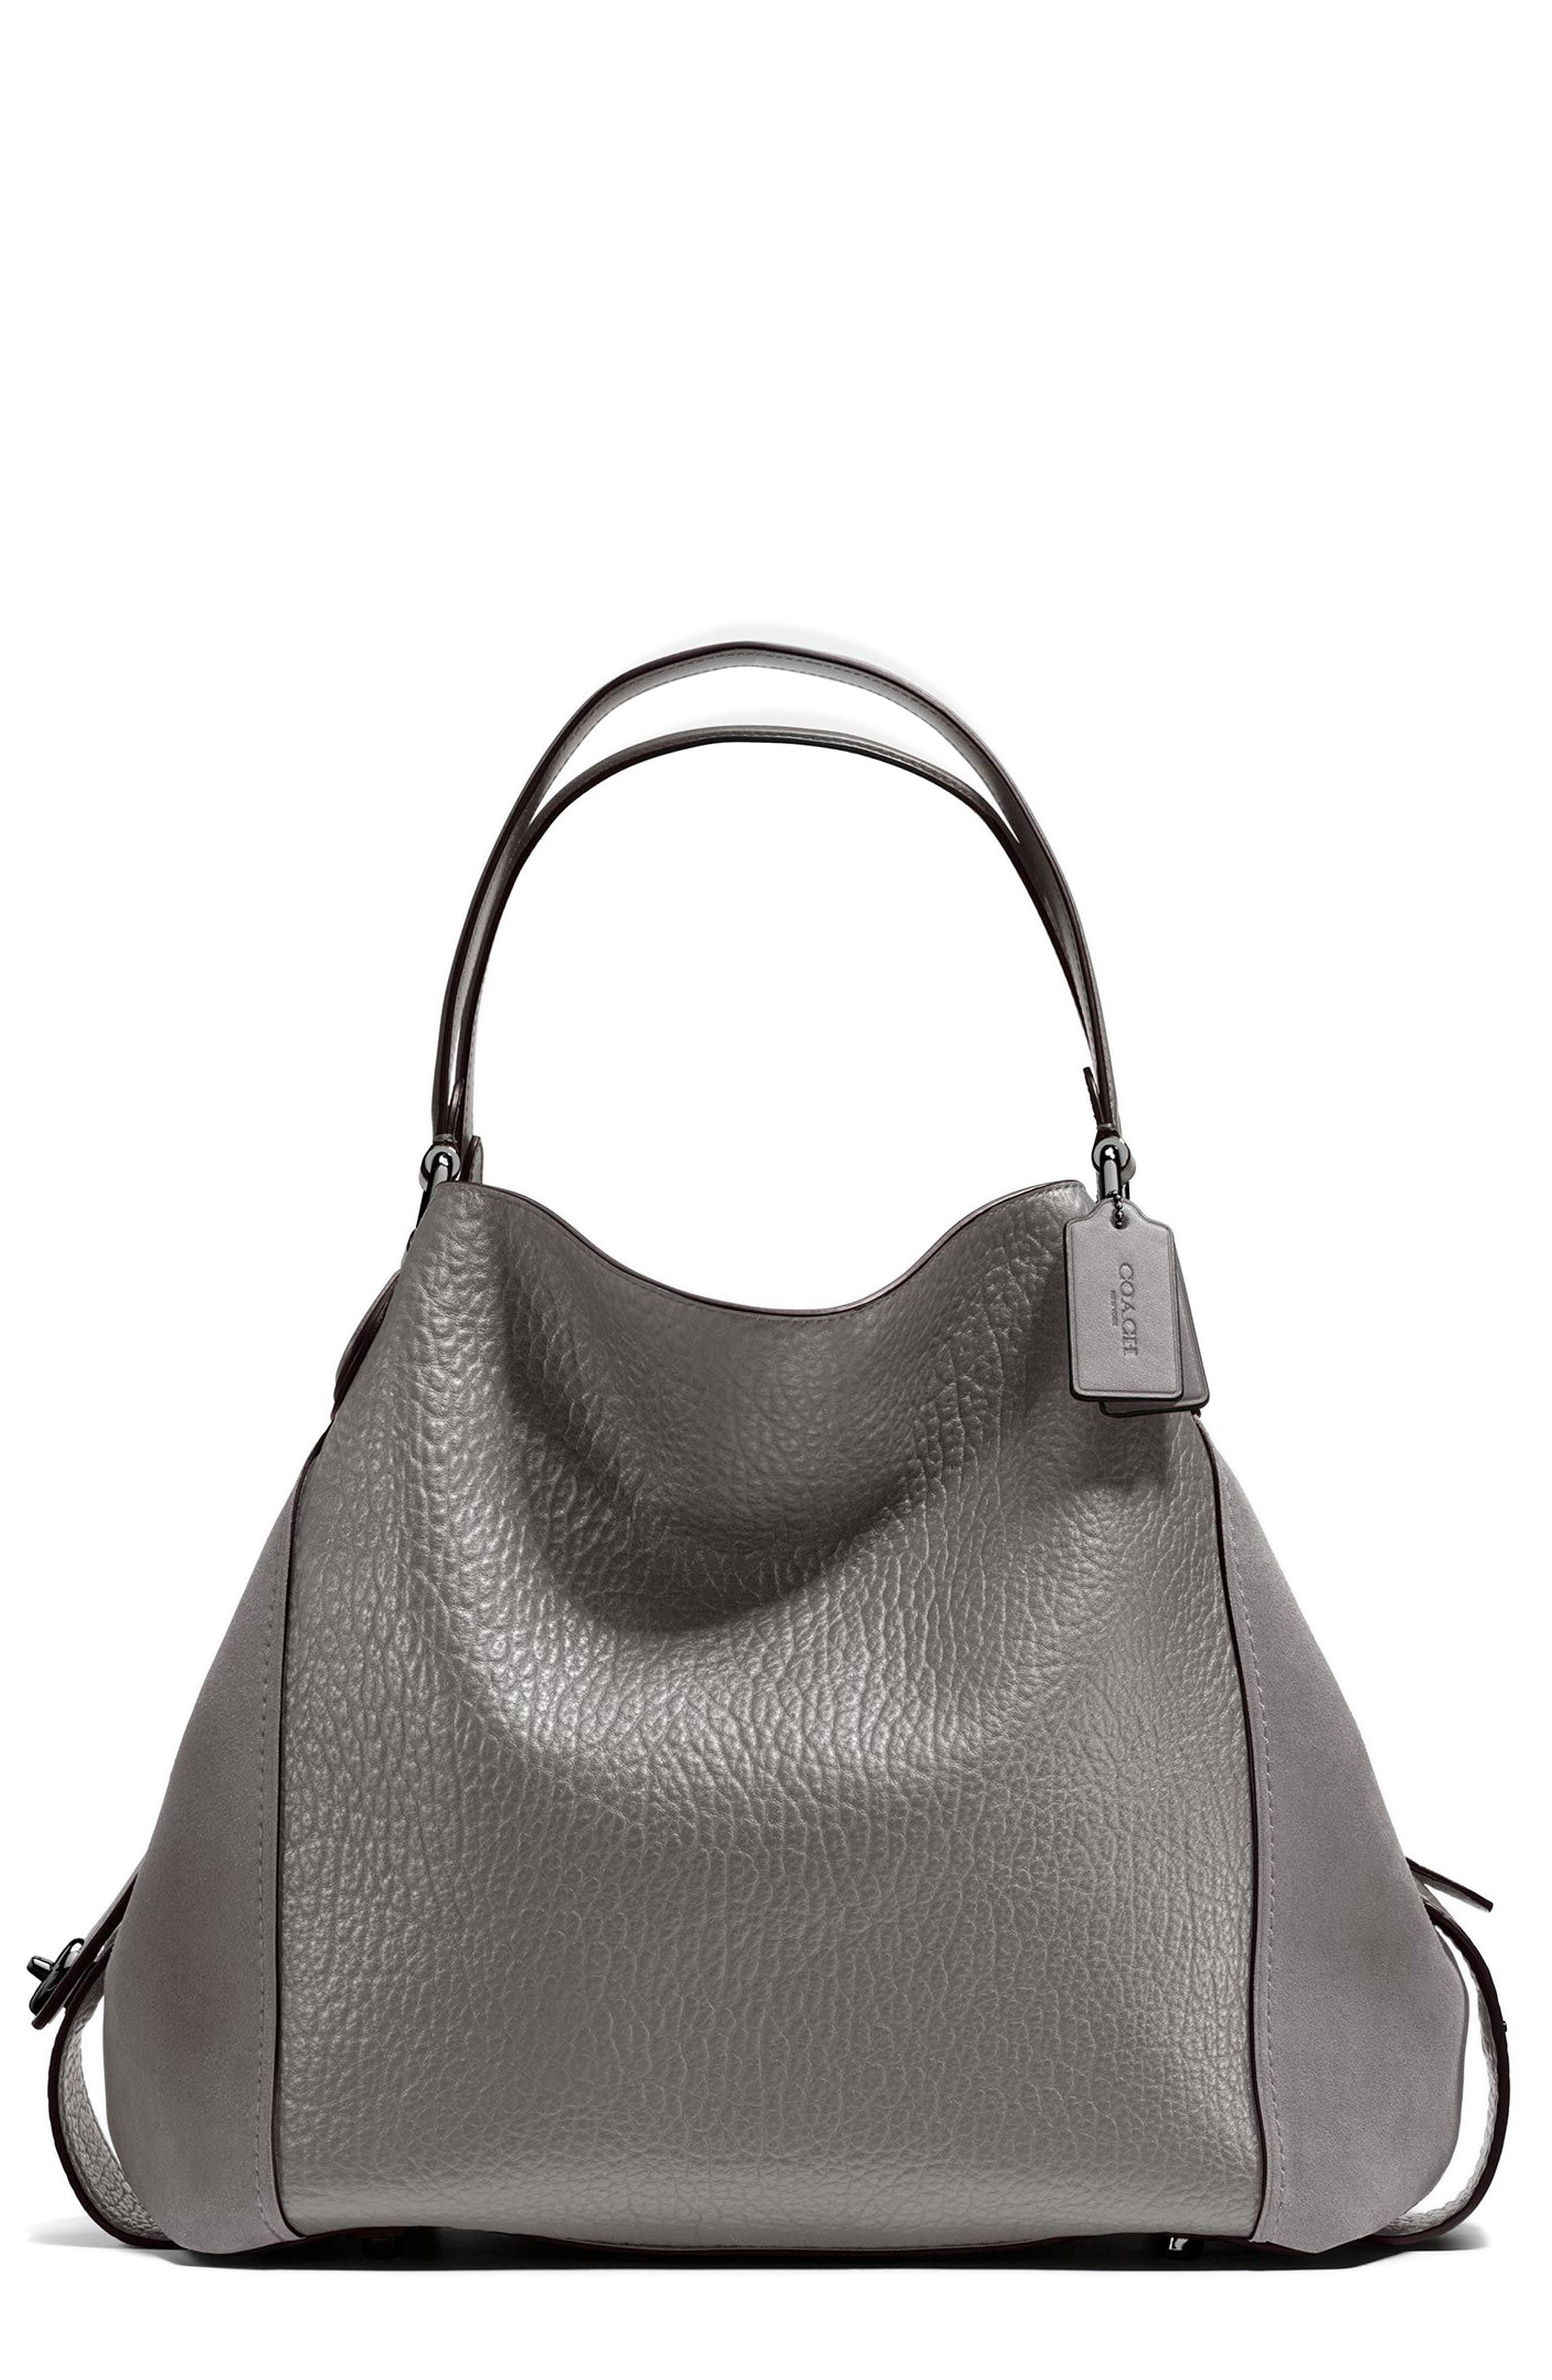 Edie 42 Leather & Suede Shoulder Bag,                             Main thumbnail 1, color,                             Heather Grey